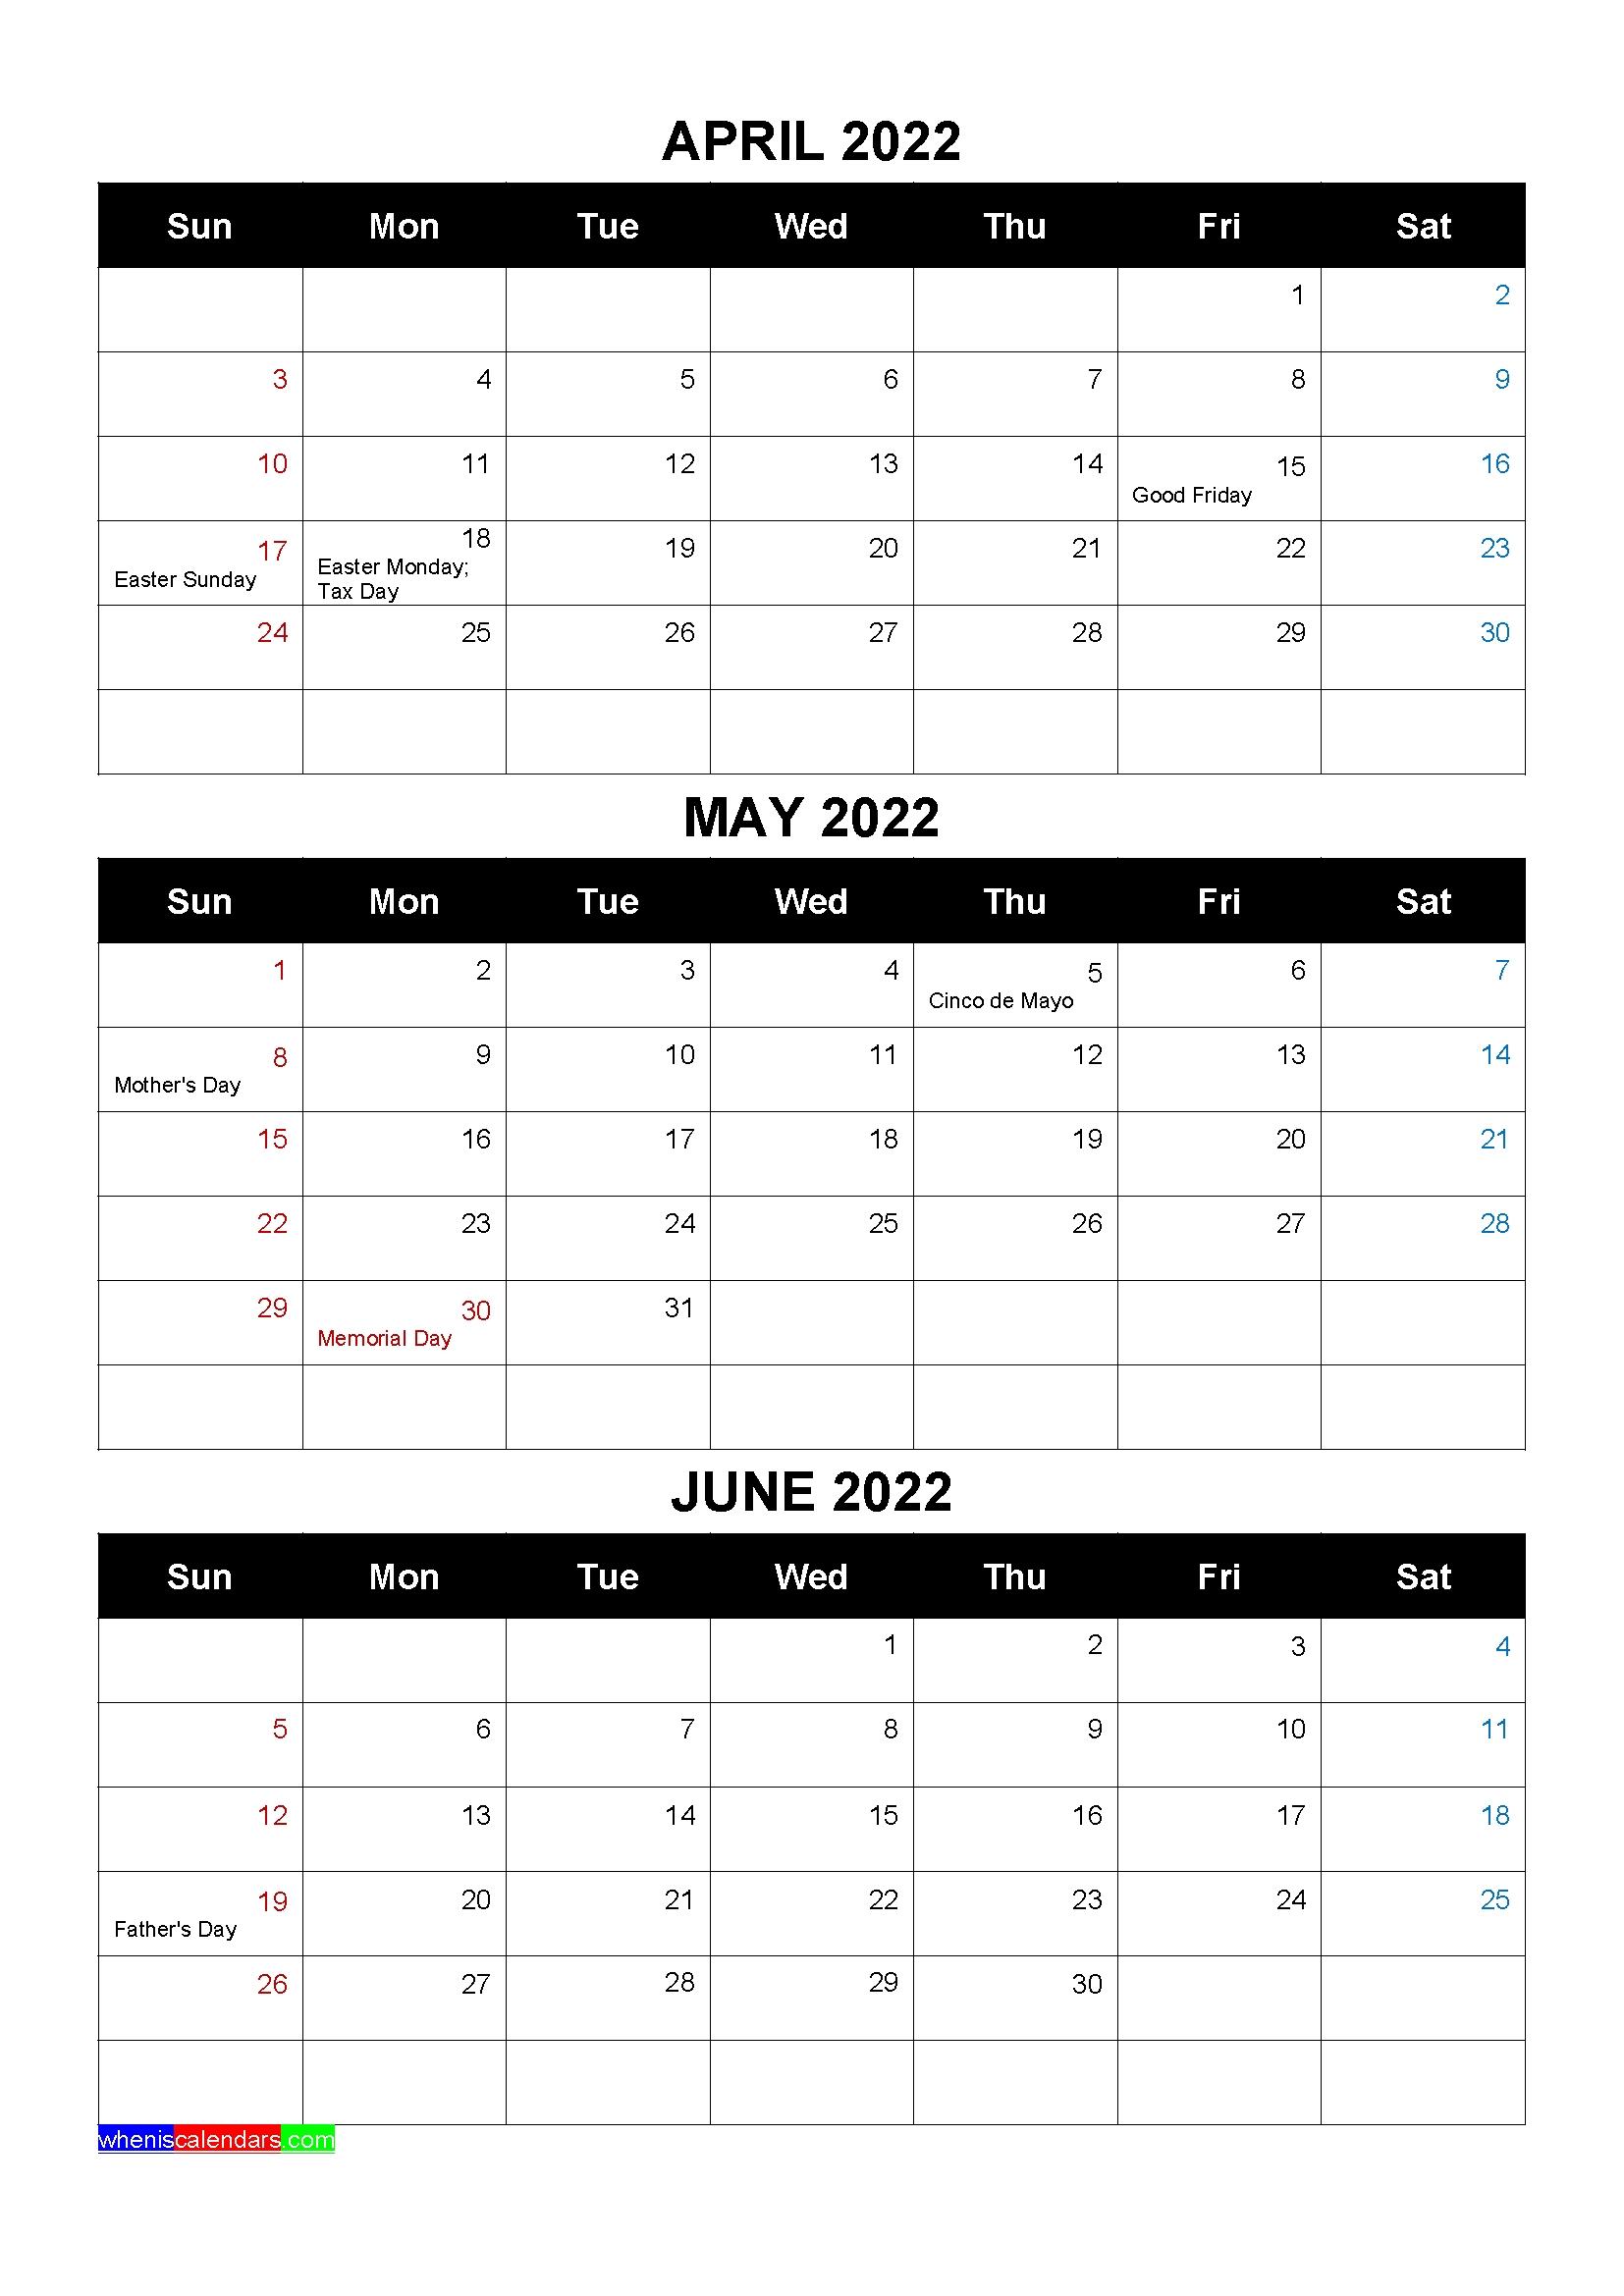 2021 Calendar Year Quarters - Yearmon